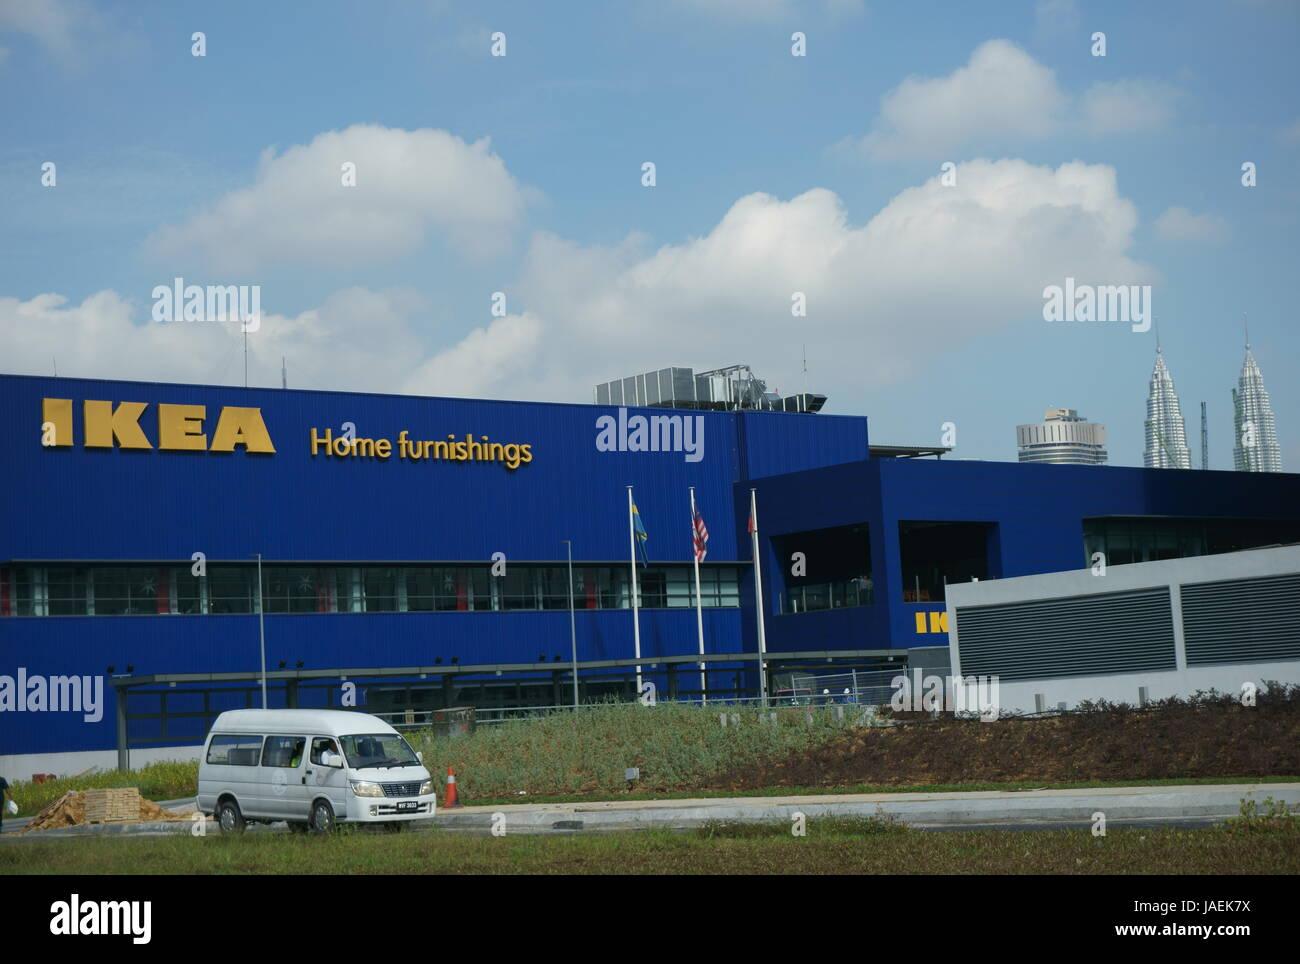 Tienda de muebles para el hogar Ikea en Kuala Lumpur, Malasia Foto ...